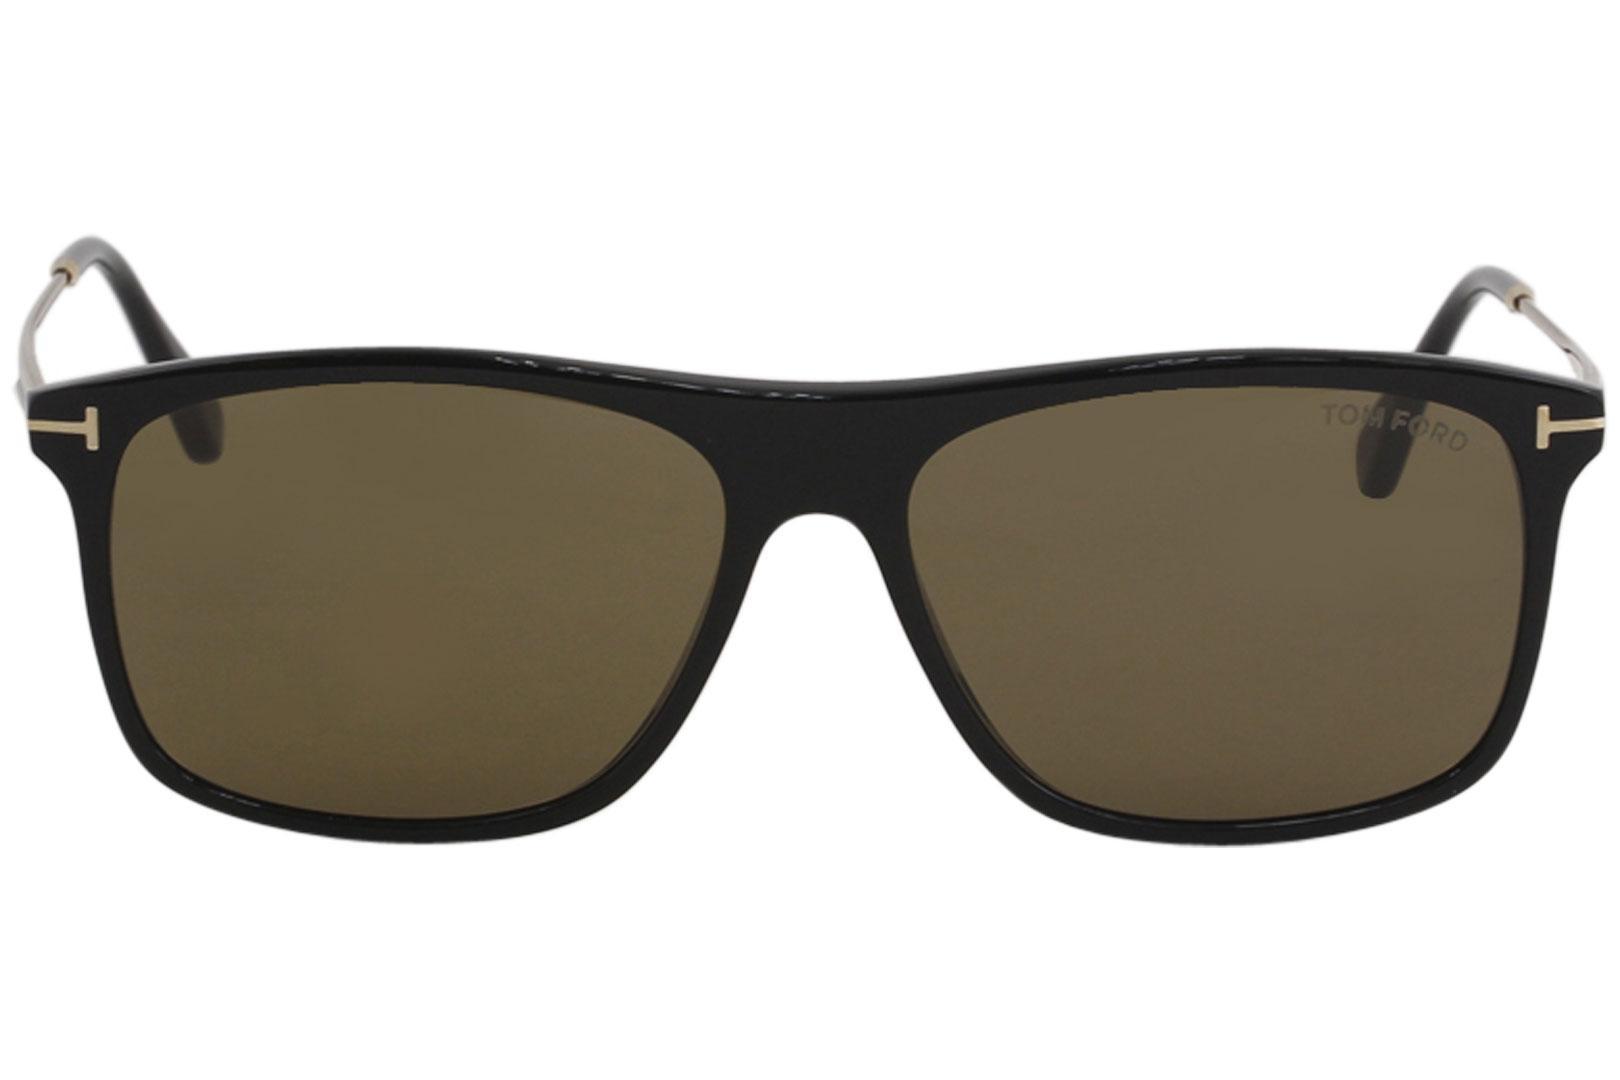 5e242e9db8 Tom Ford Men s Max-02 TF588 TF 588 Fashion Square Sunglasses by Tom Ford